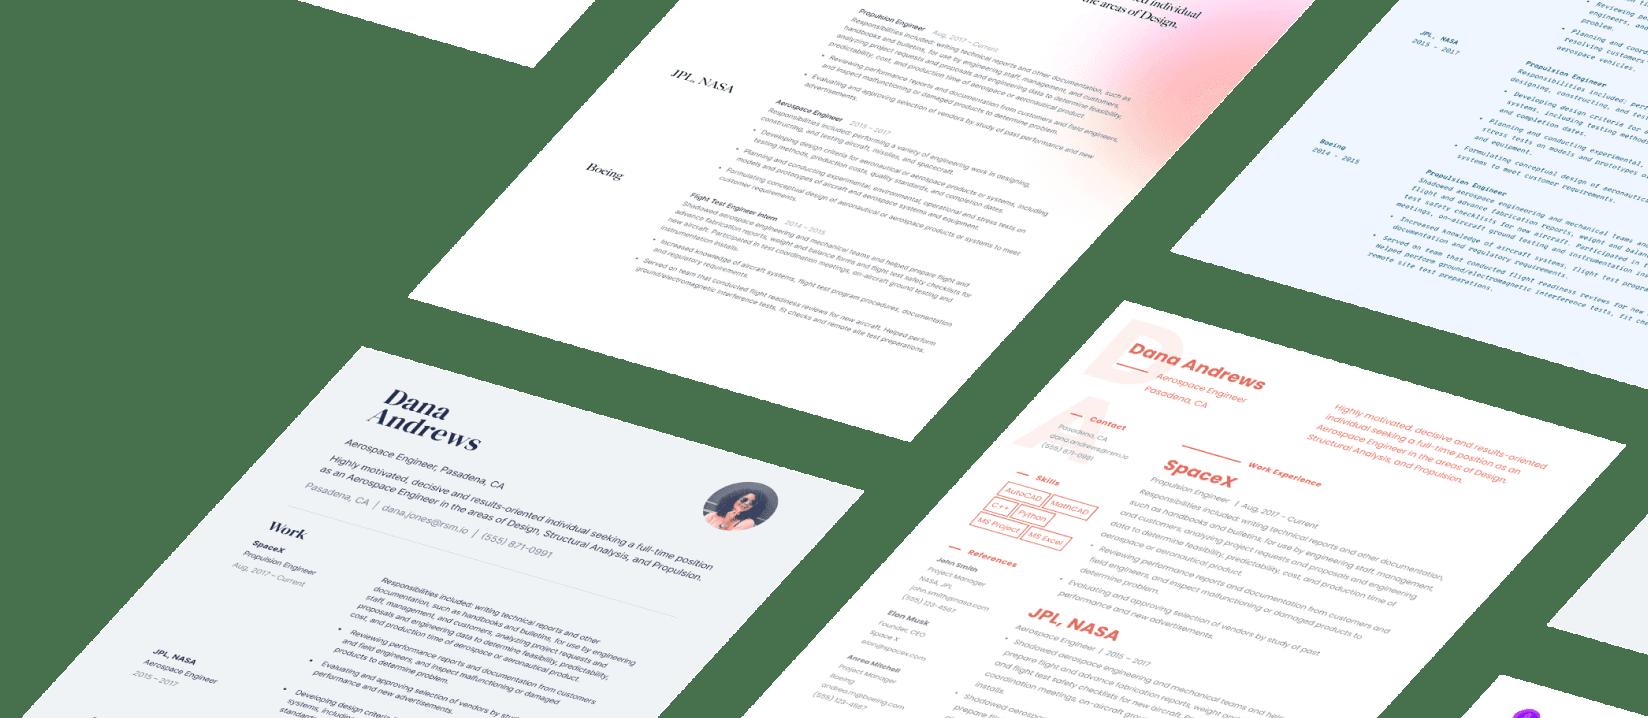 Resumes built using Standard Resume templates